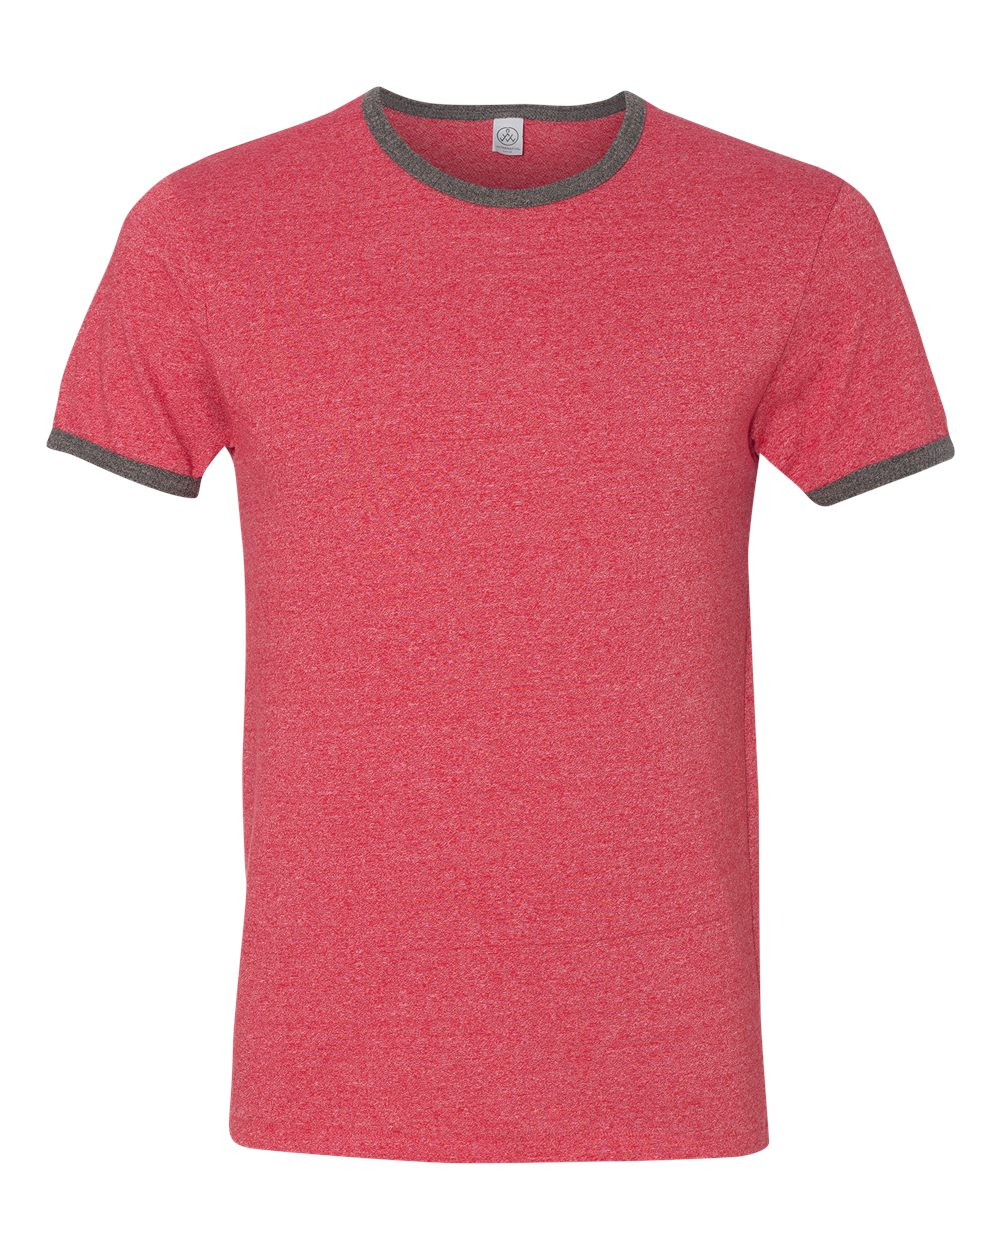 Custom ringer t shirt kirkwood trading company for Custom screen print shirt